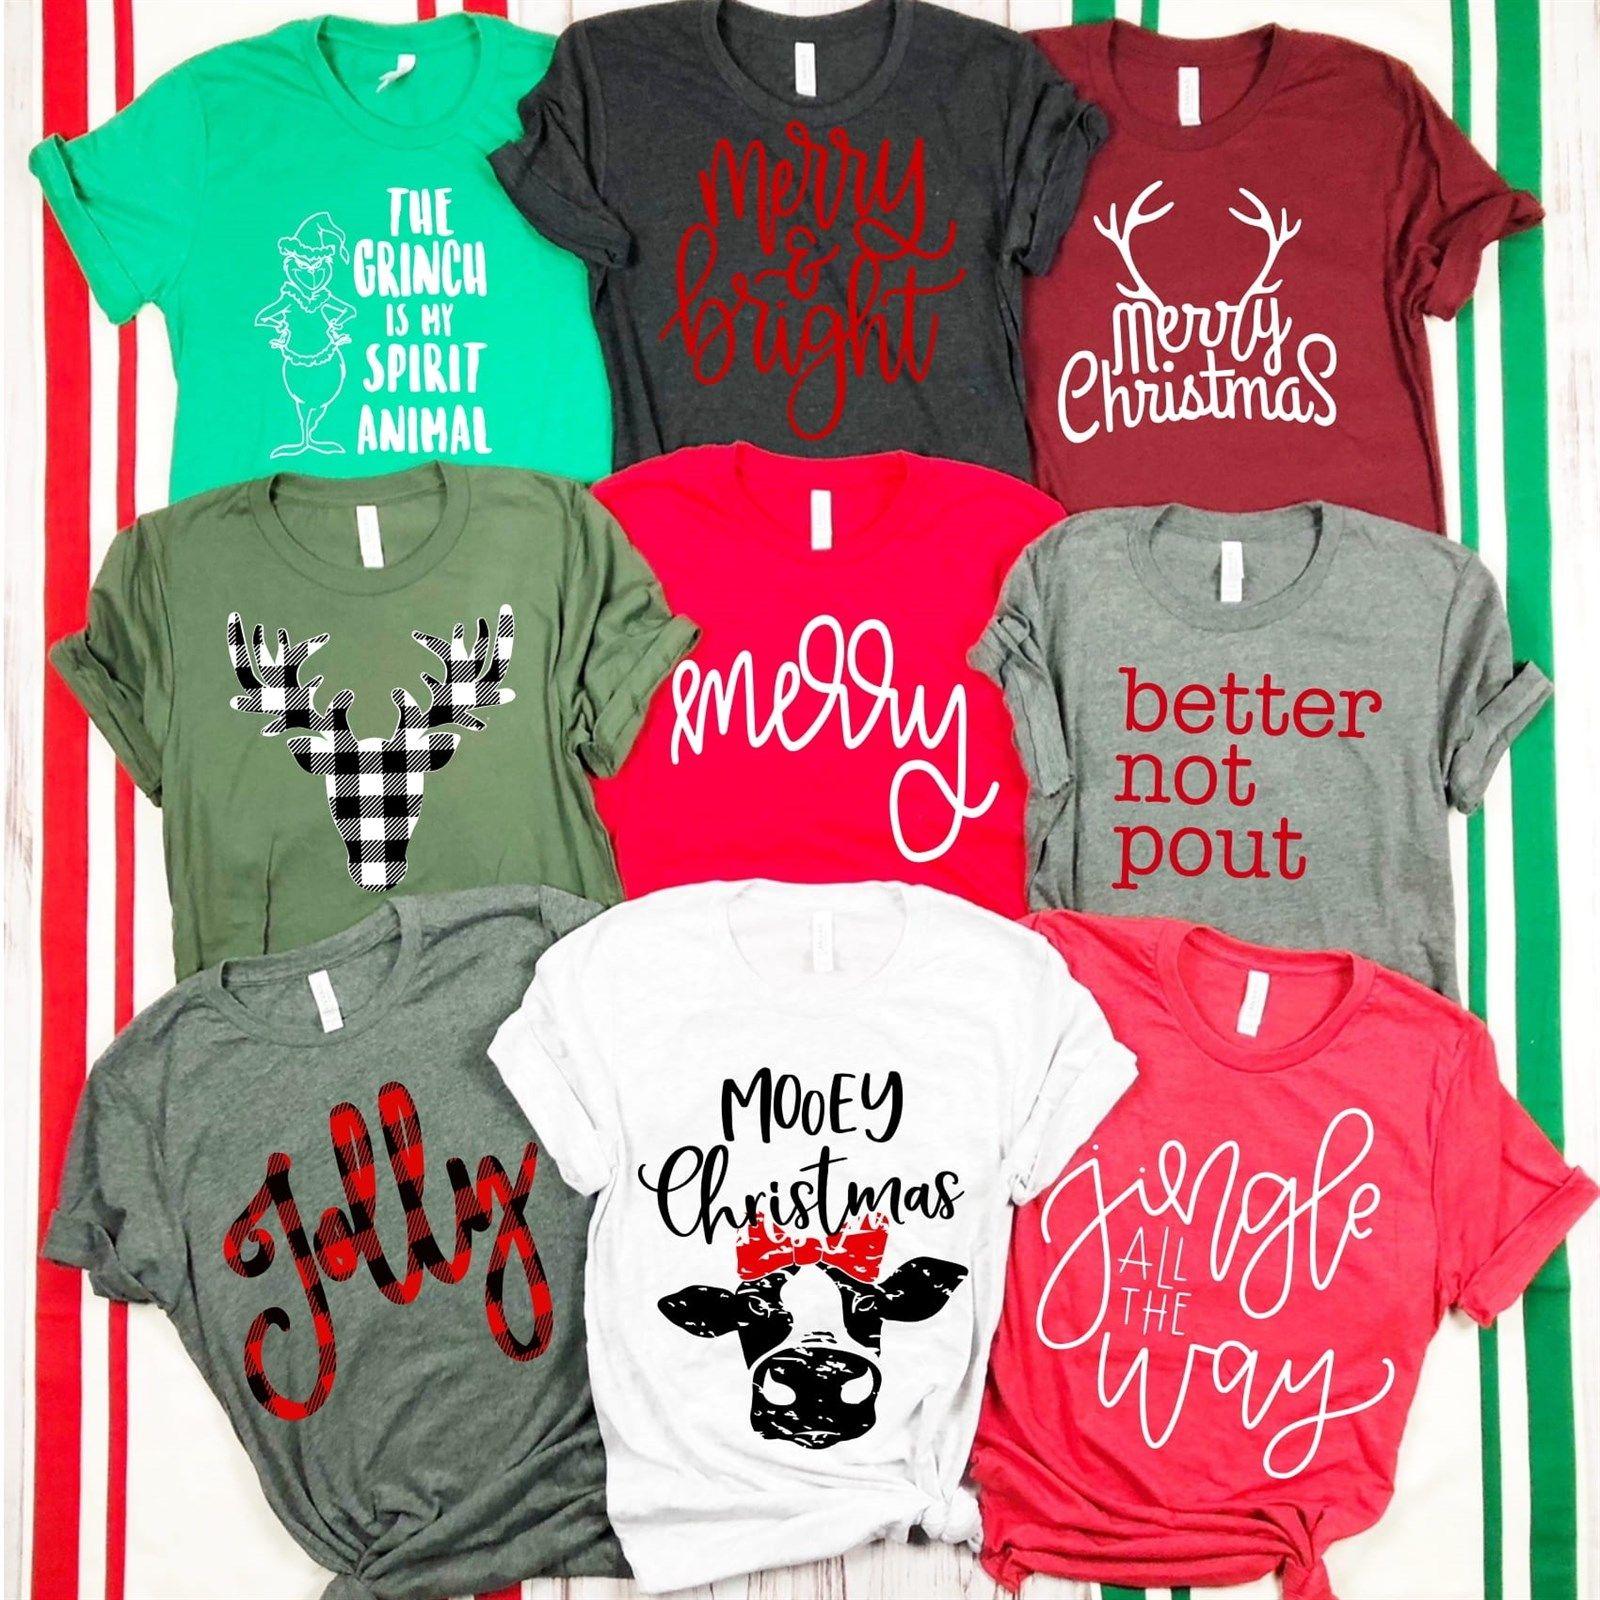 c209de0b84 Christmas Shirt for Women | Women's Christmas Shirt | Grandma Shirt | Nana  Shirt | Grammy Shirt | Gift for Grandma | Grandkids Name… | Things 2 Make.